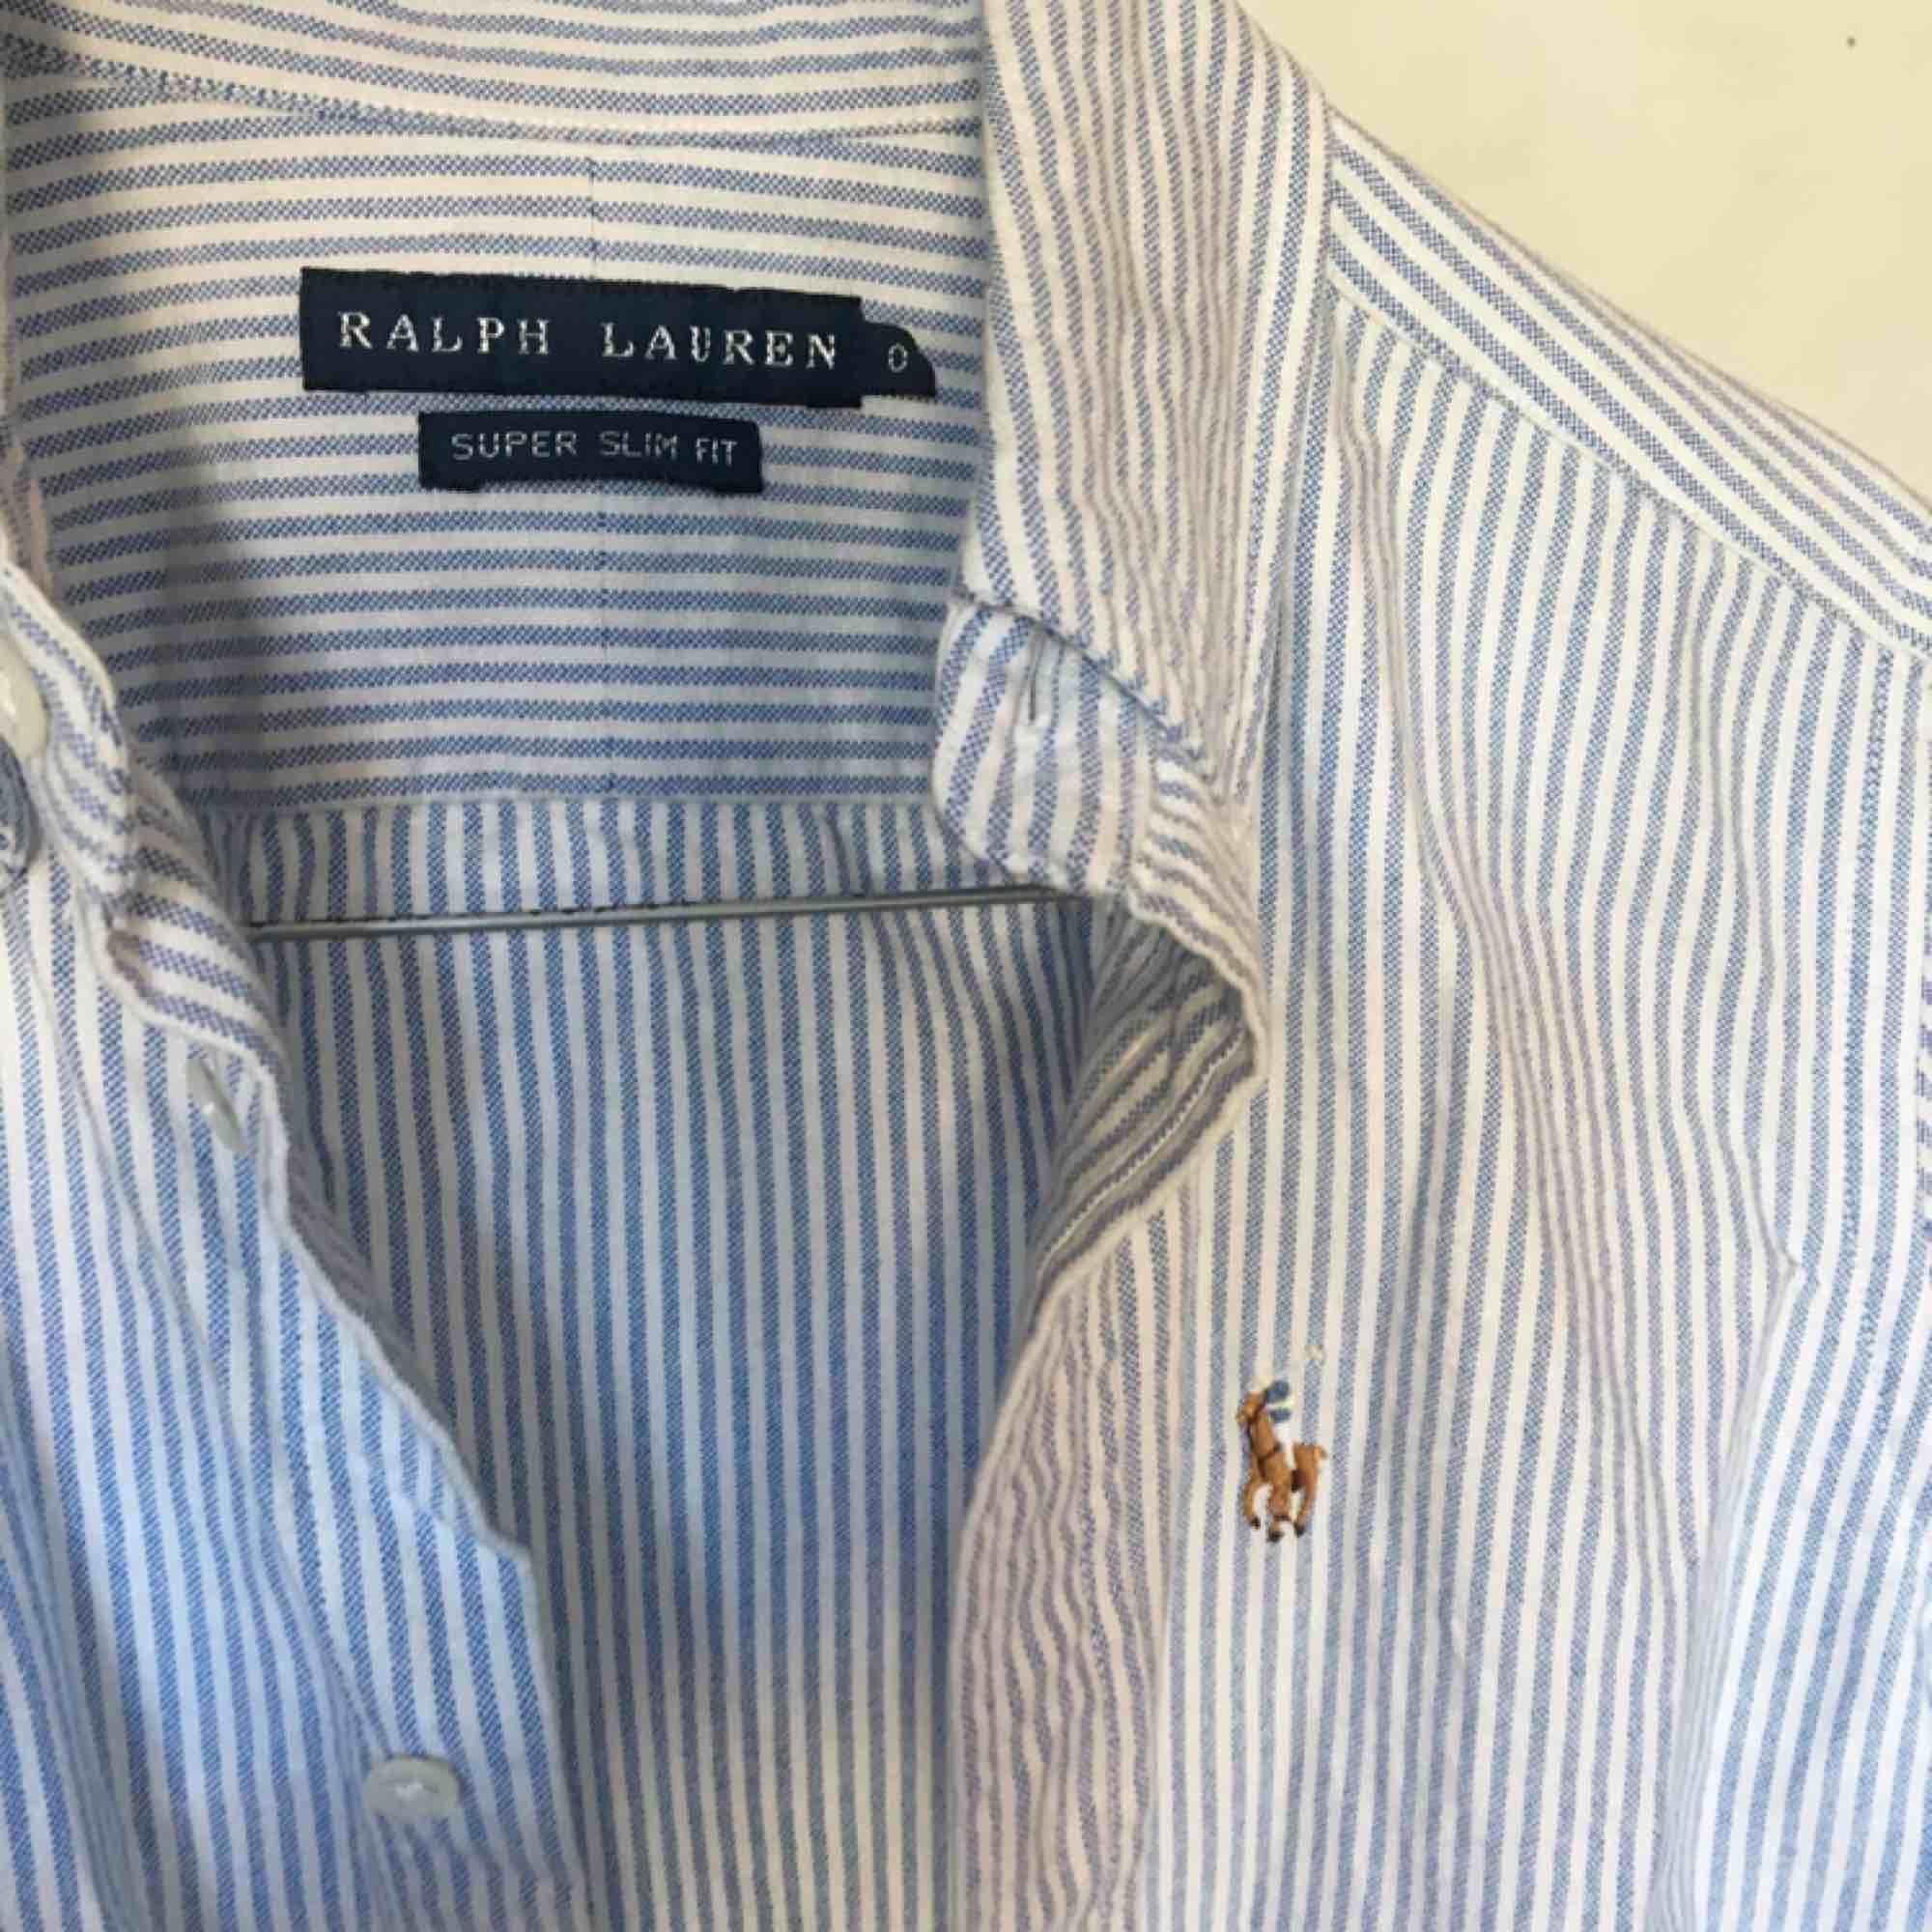 Ralph lauren skjorta. Skjortor.